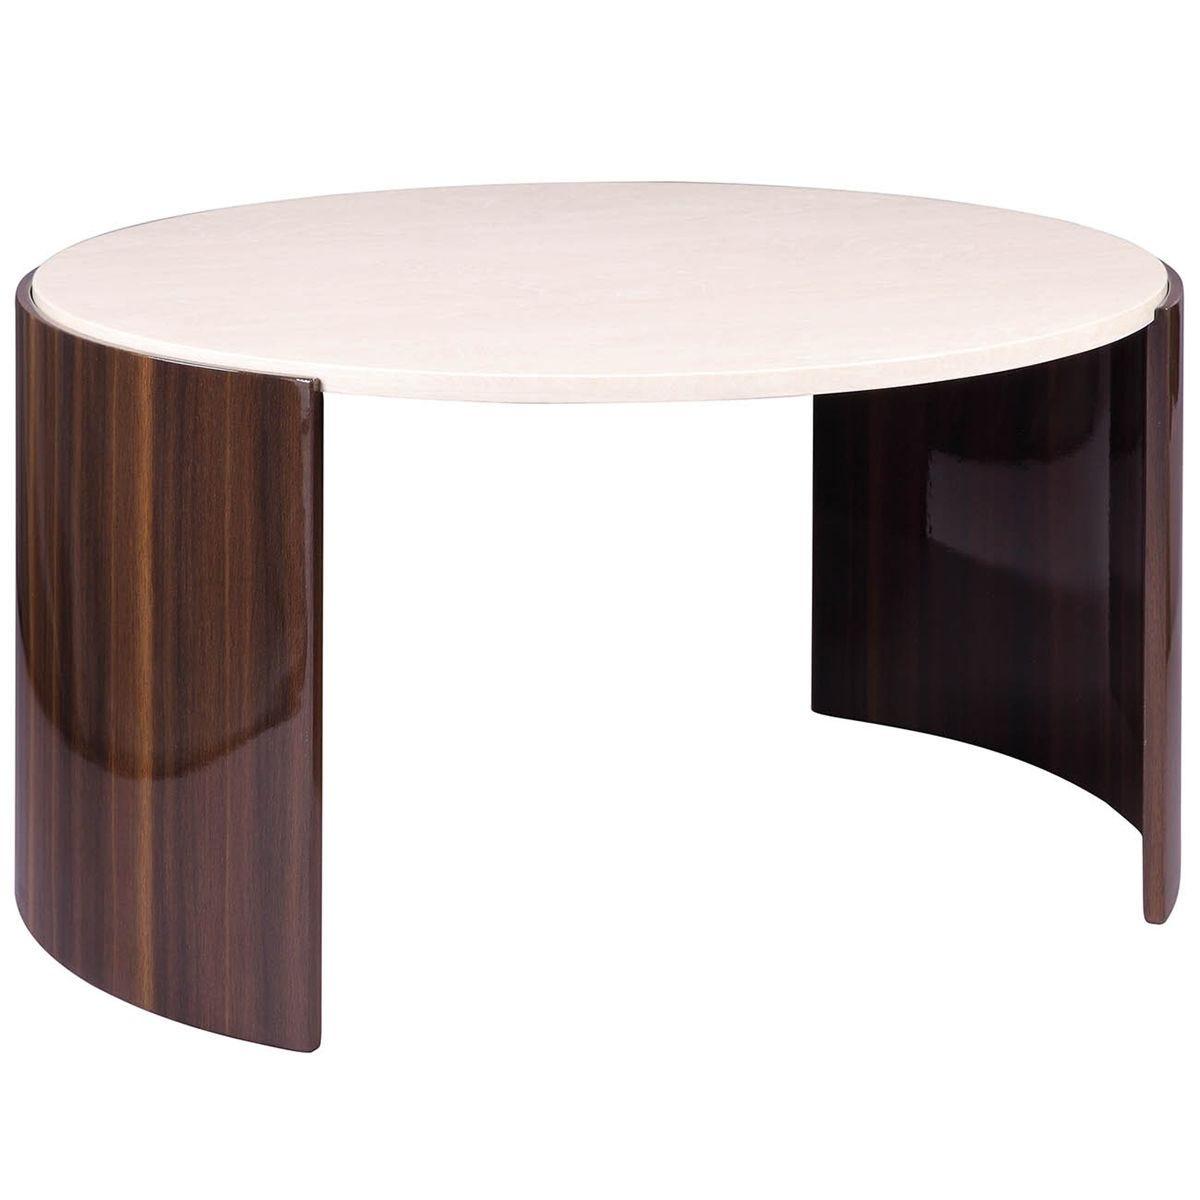 Jual Milan Walnut High Gloss Coffee Table